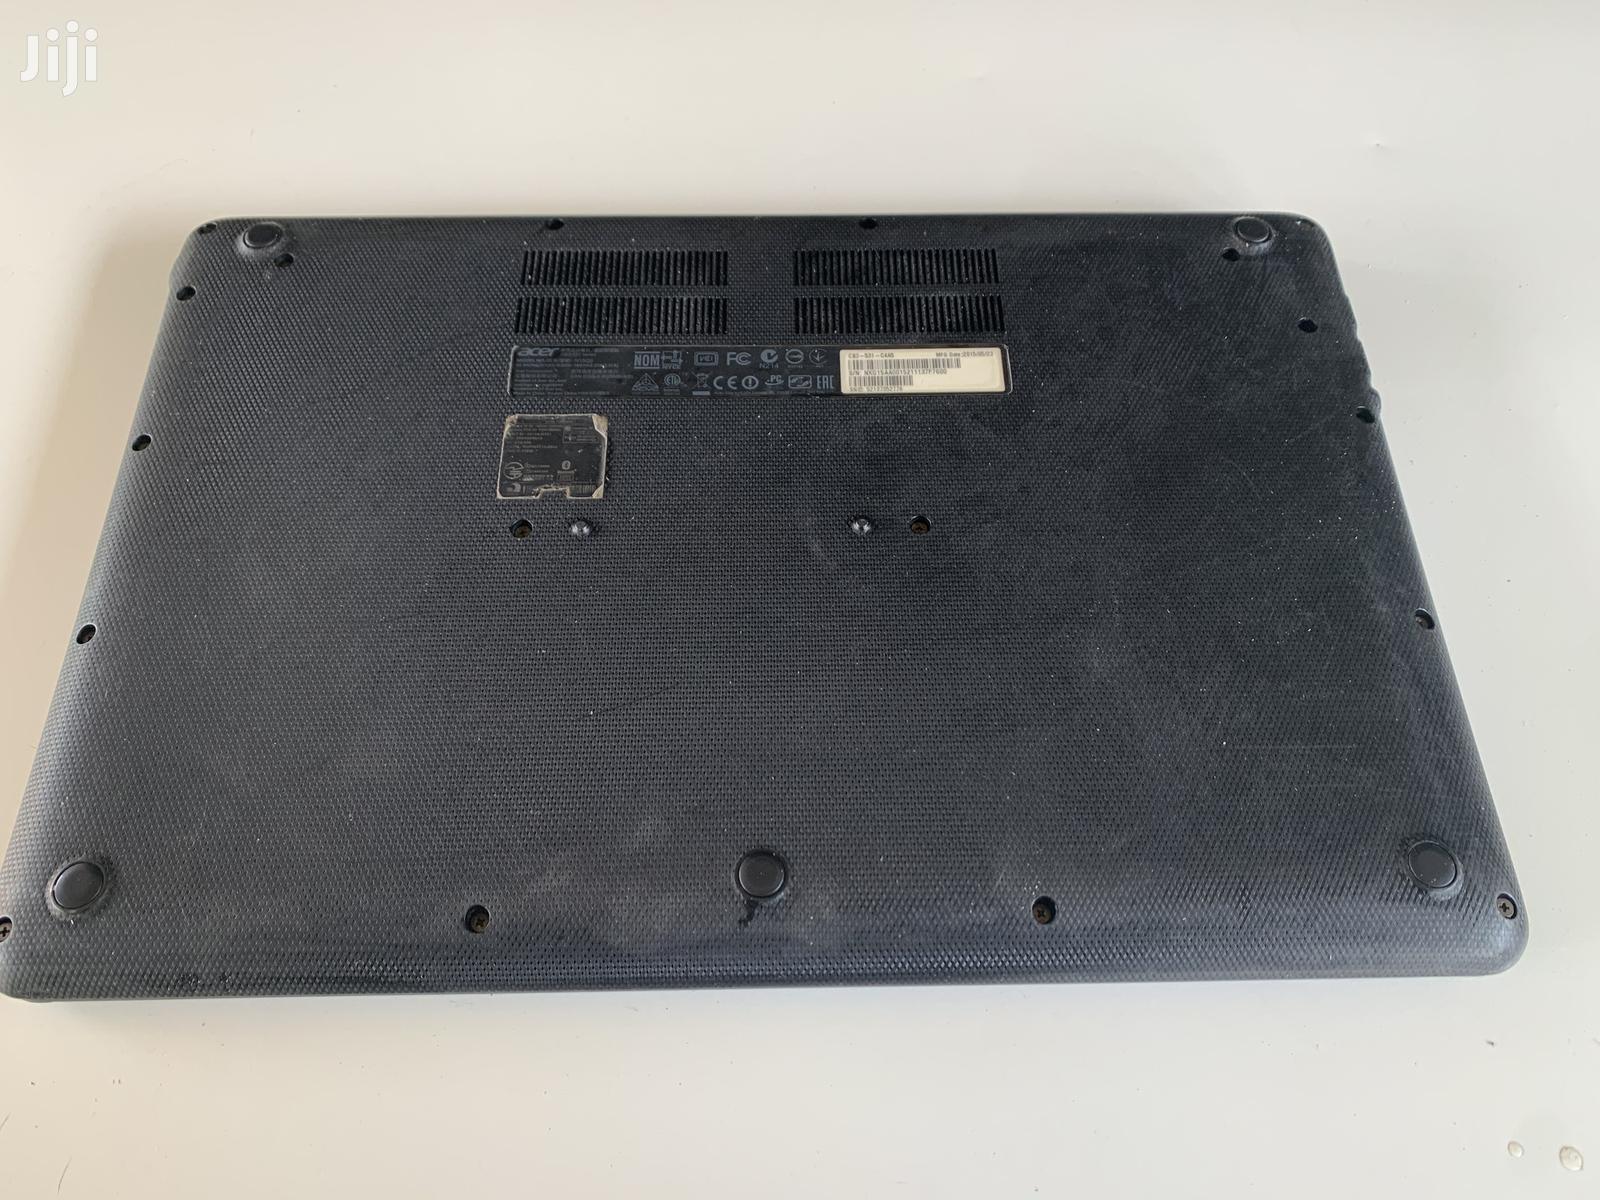 Archive: Laptop Acer Chromebook 15 2GB Intel Celeron SSD 16 GB